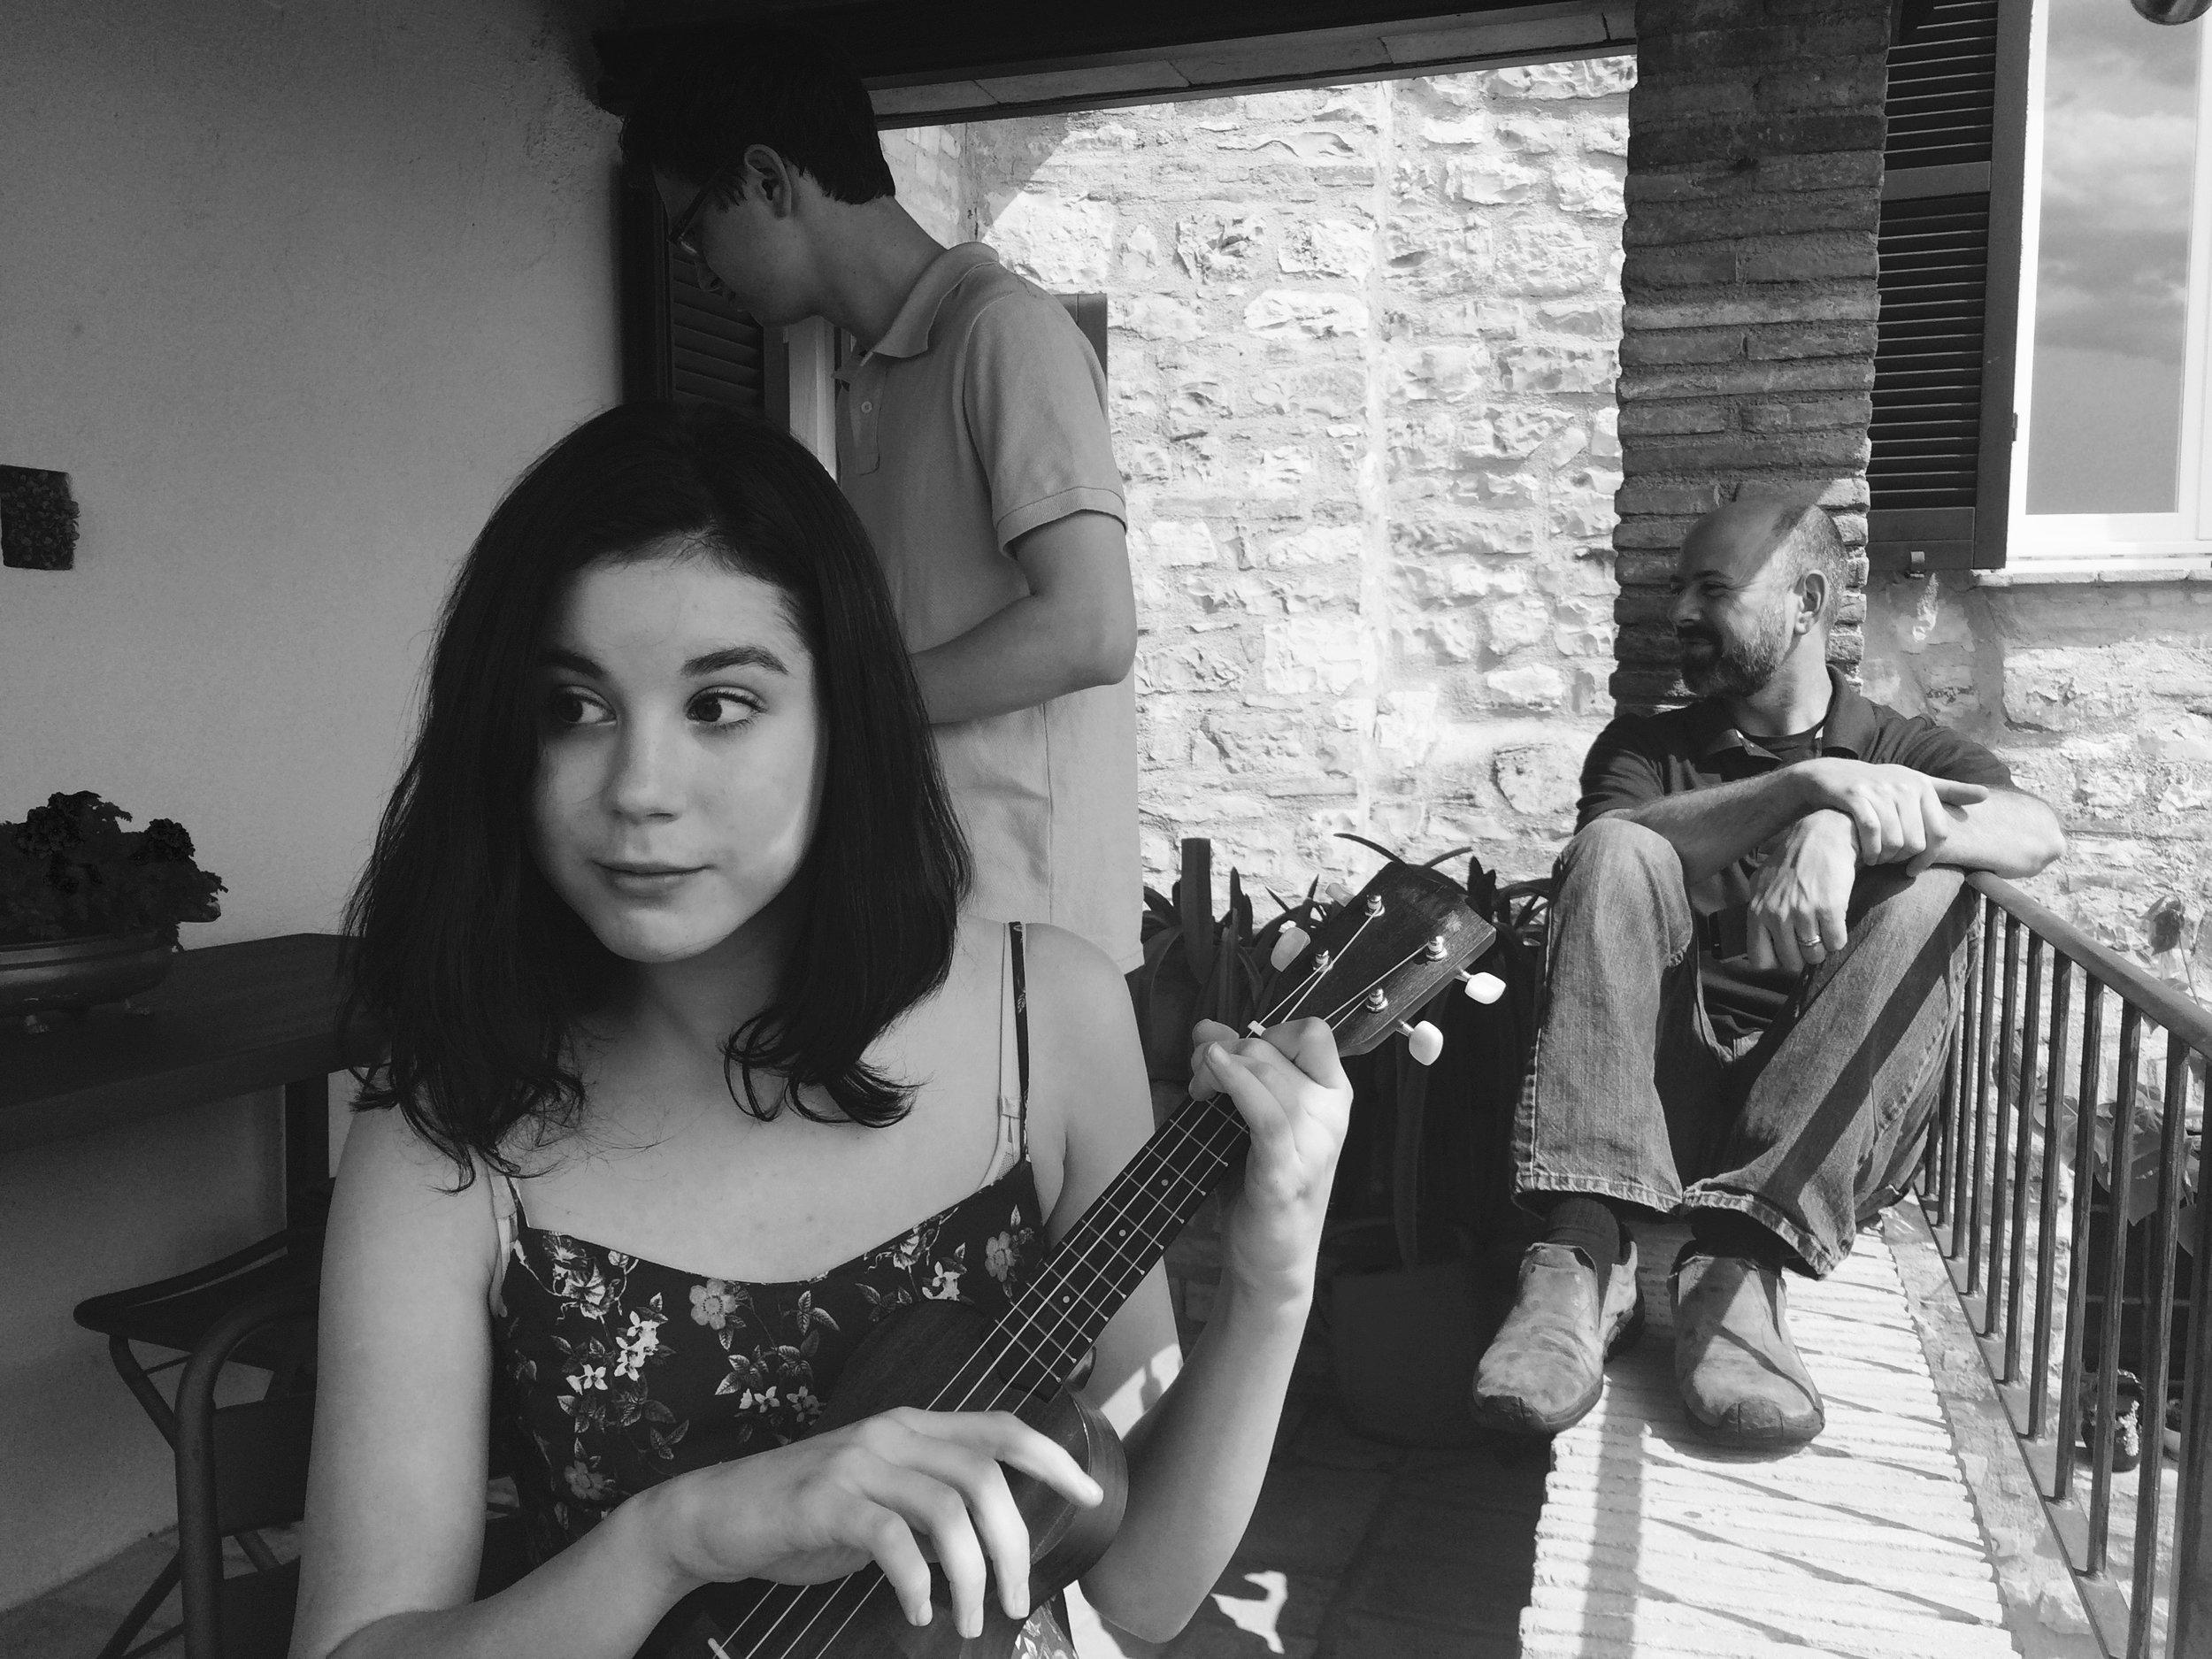 Siena playing uke in Spello, Umbria